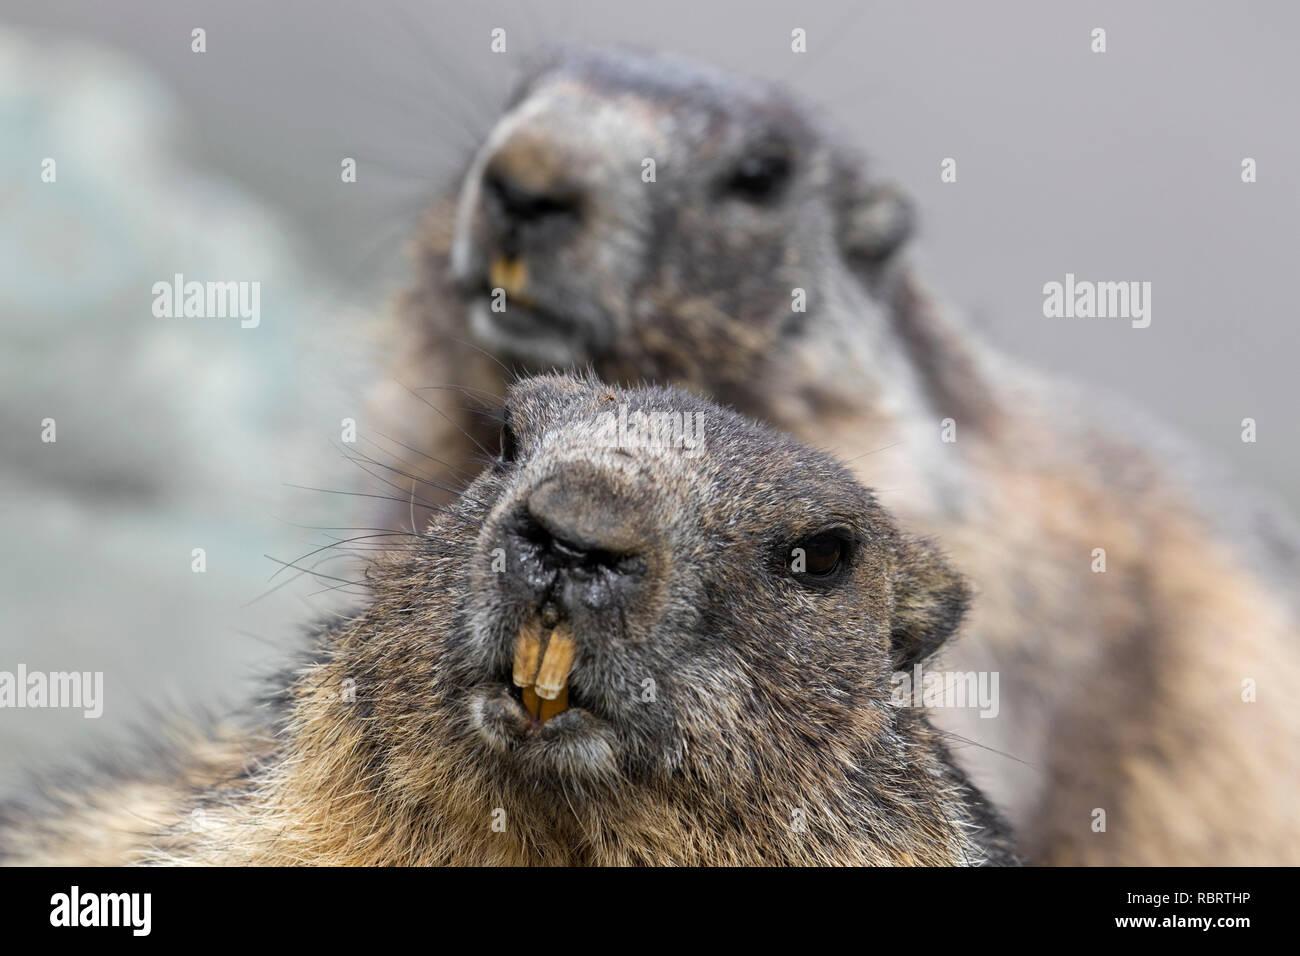 Close-up of Alpine marmot (Marmota marmota) couple showing large sharp incisors / front teeth - Stock Image